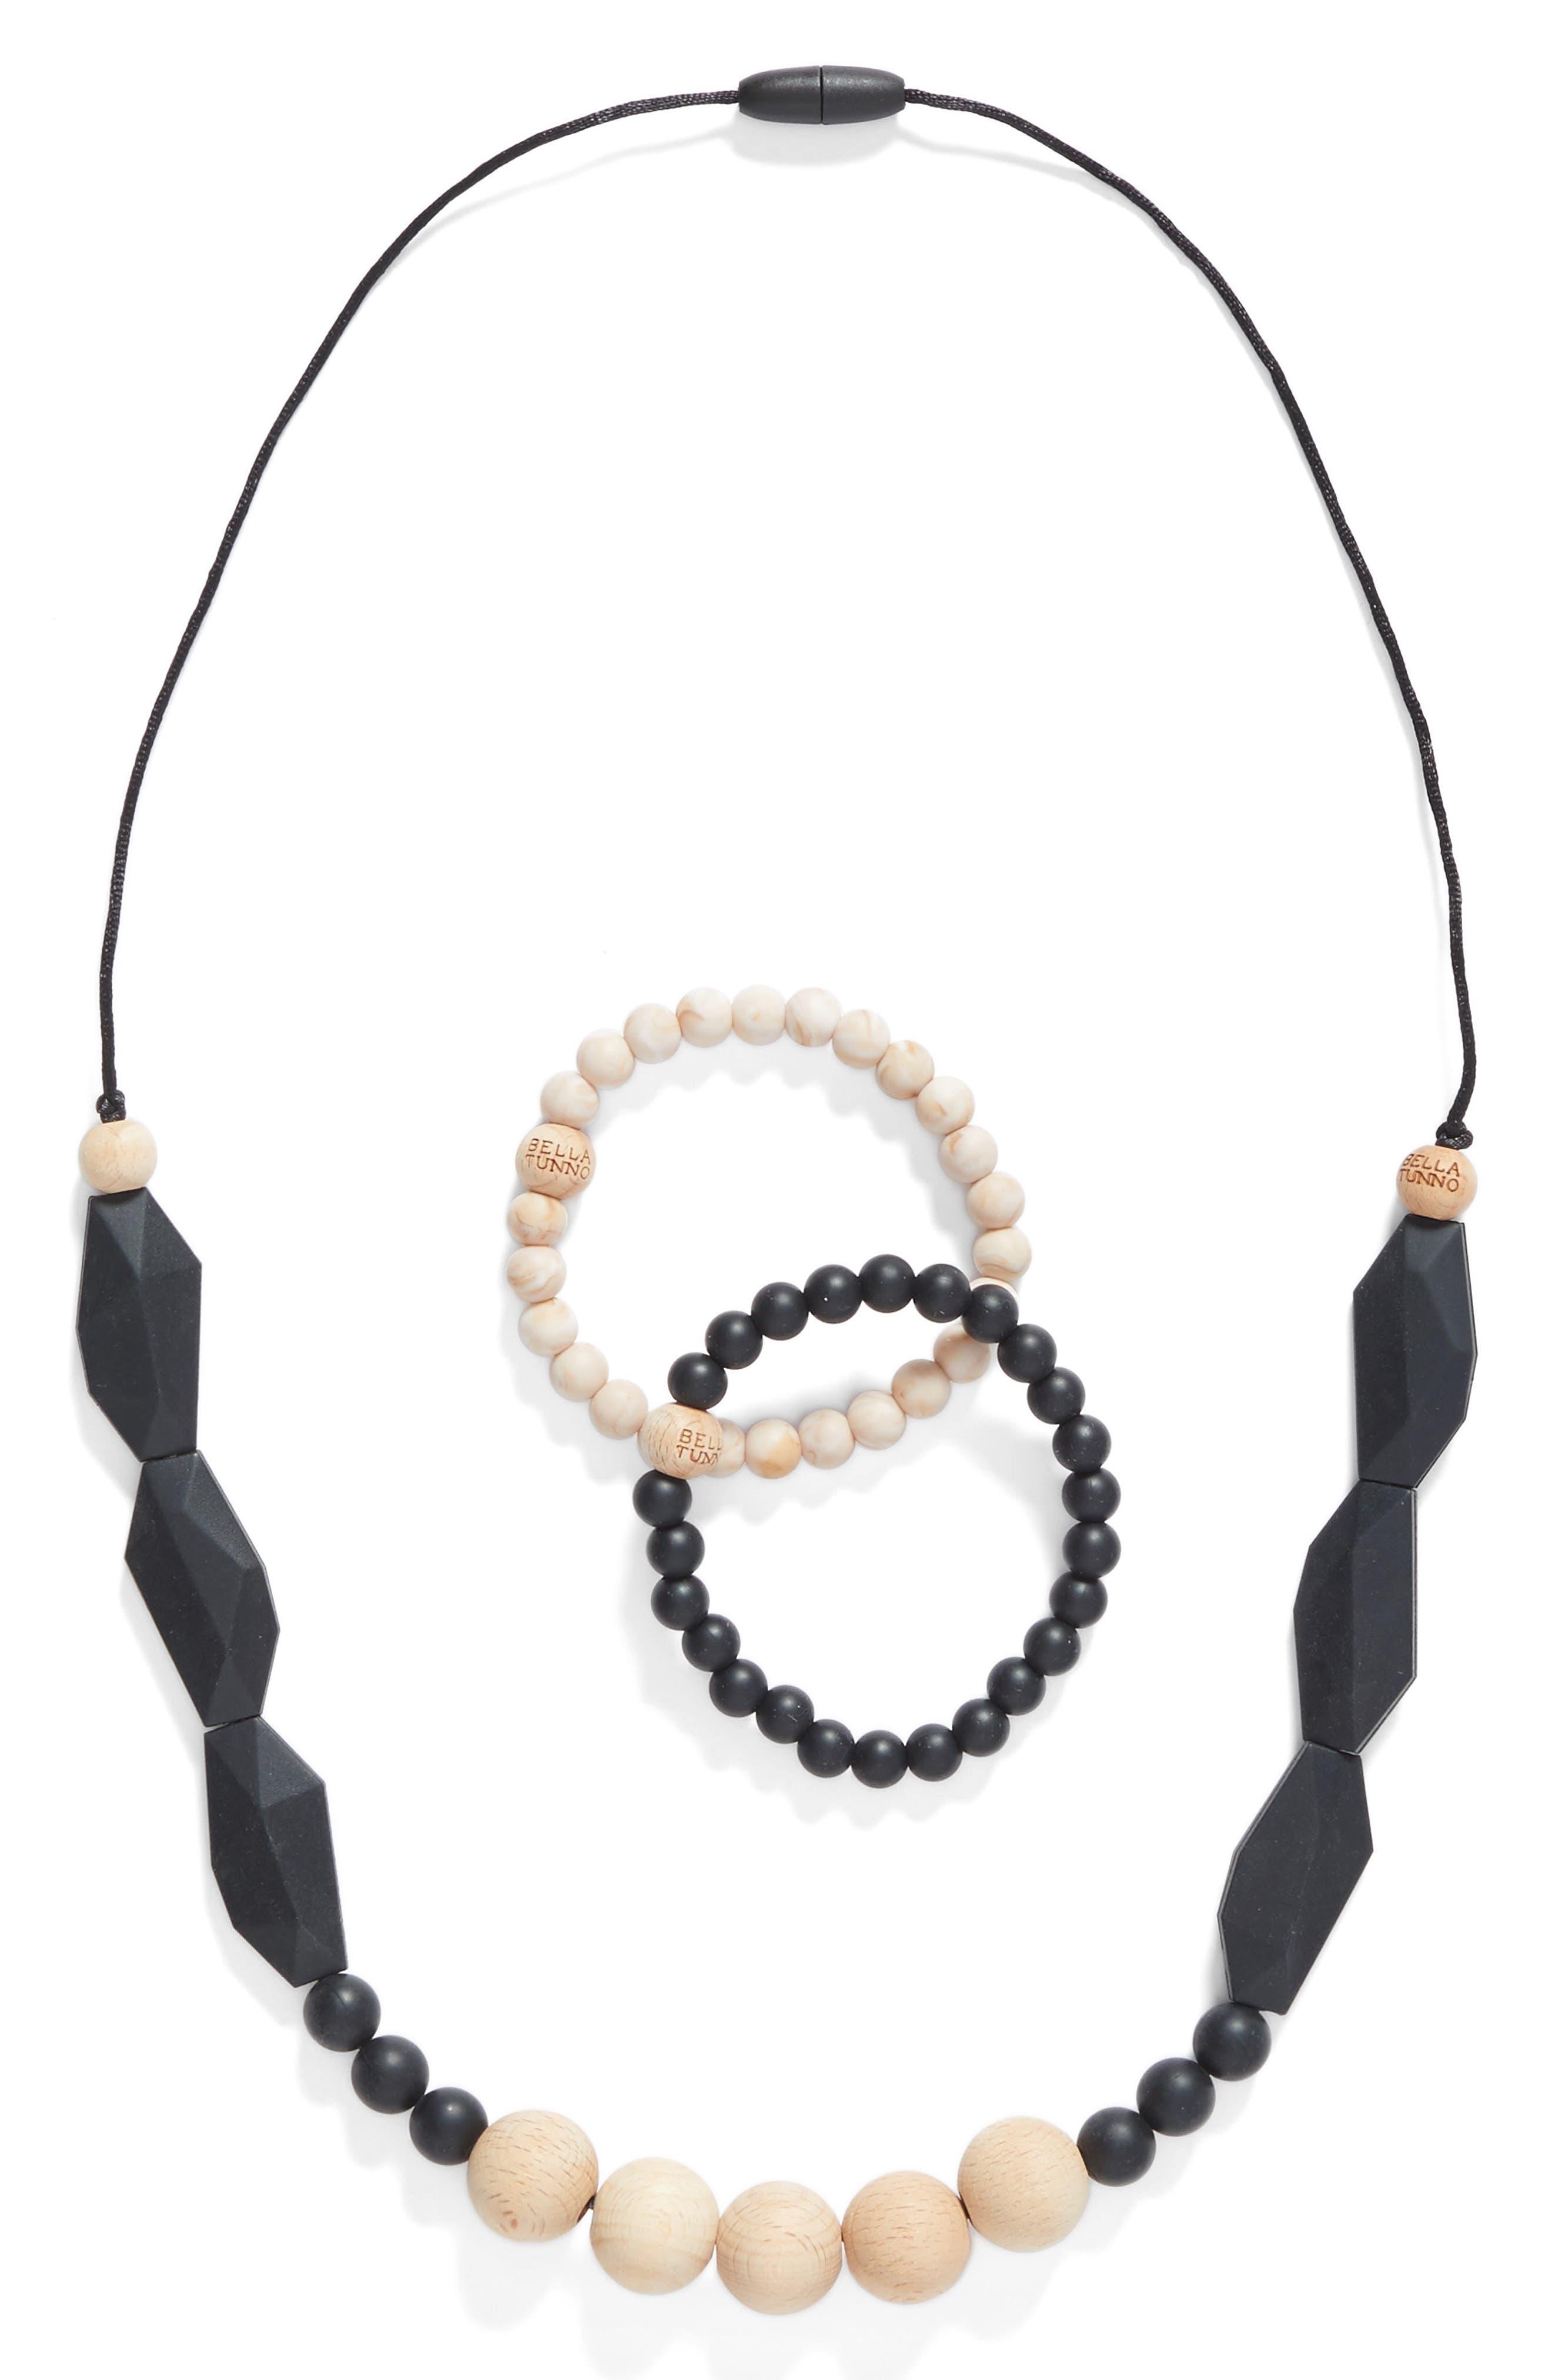 3-Piece Teething Necklace & Bracelet Set,                             Main thumbnail 1, color,                             Smoky Black